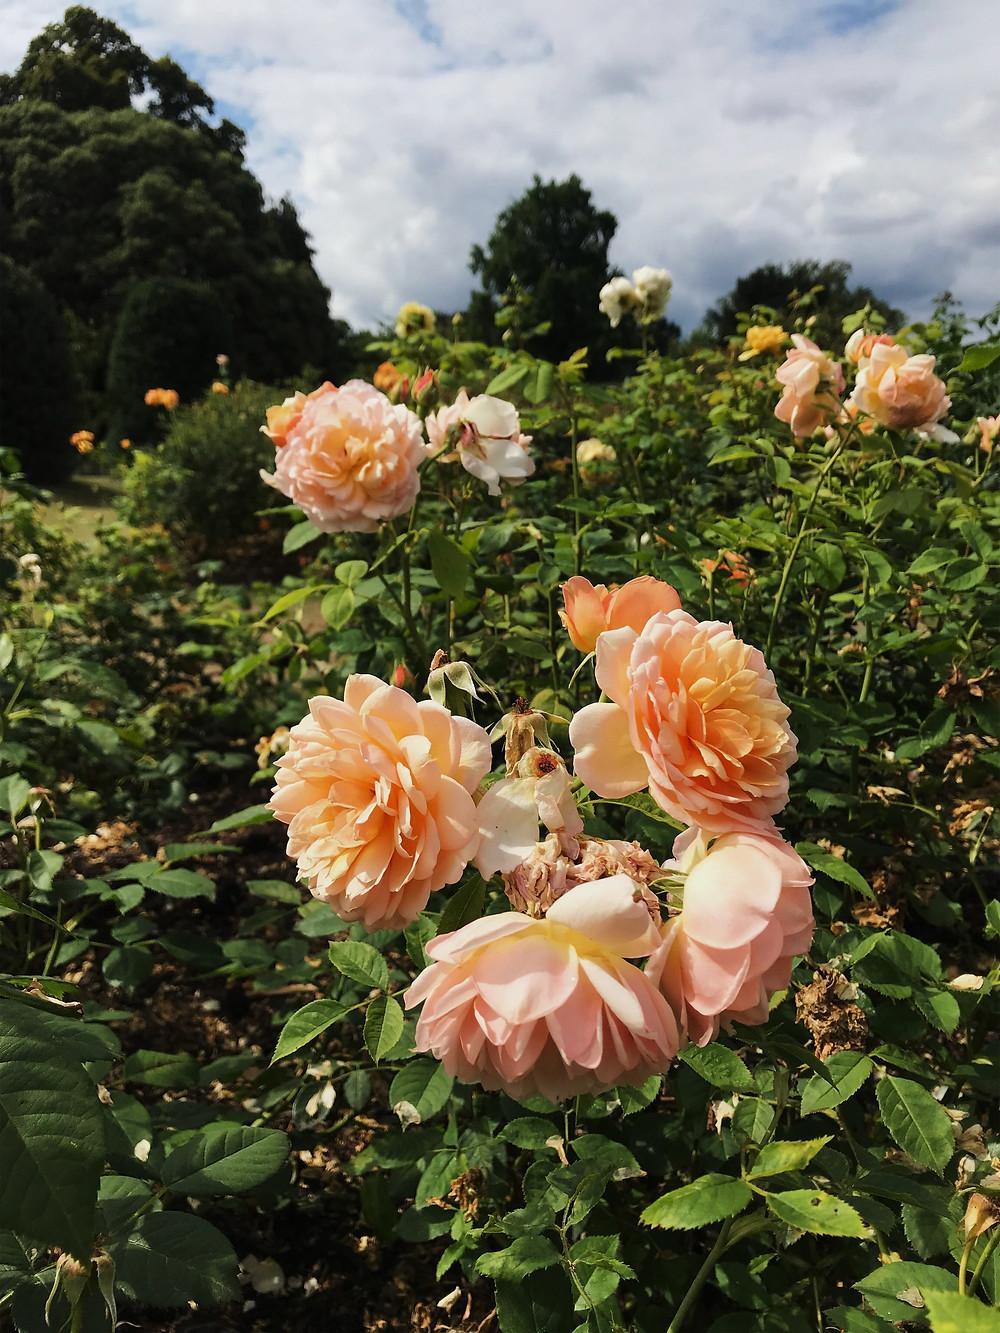 A close up of a rose at The Rose Garden at Kew Gardens